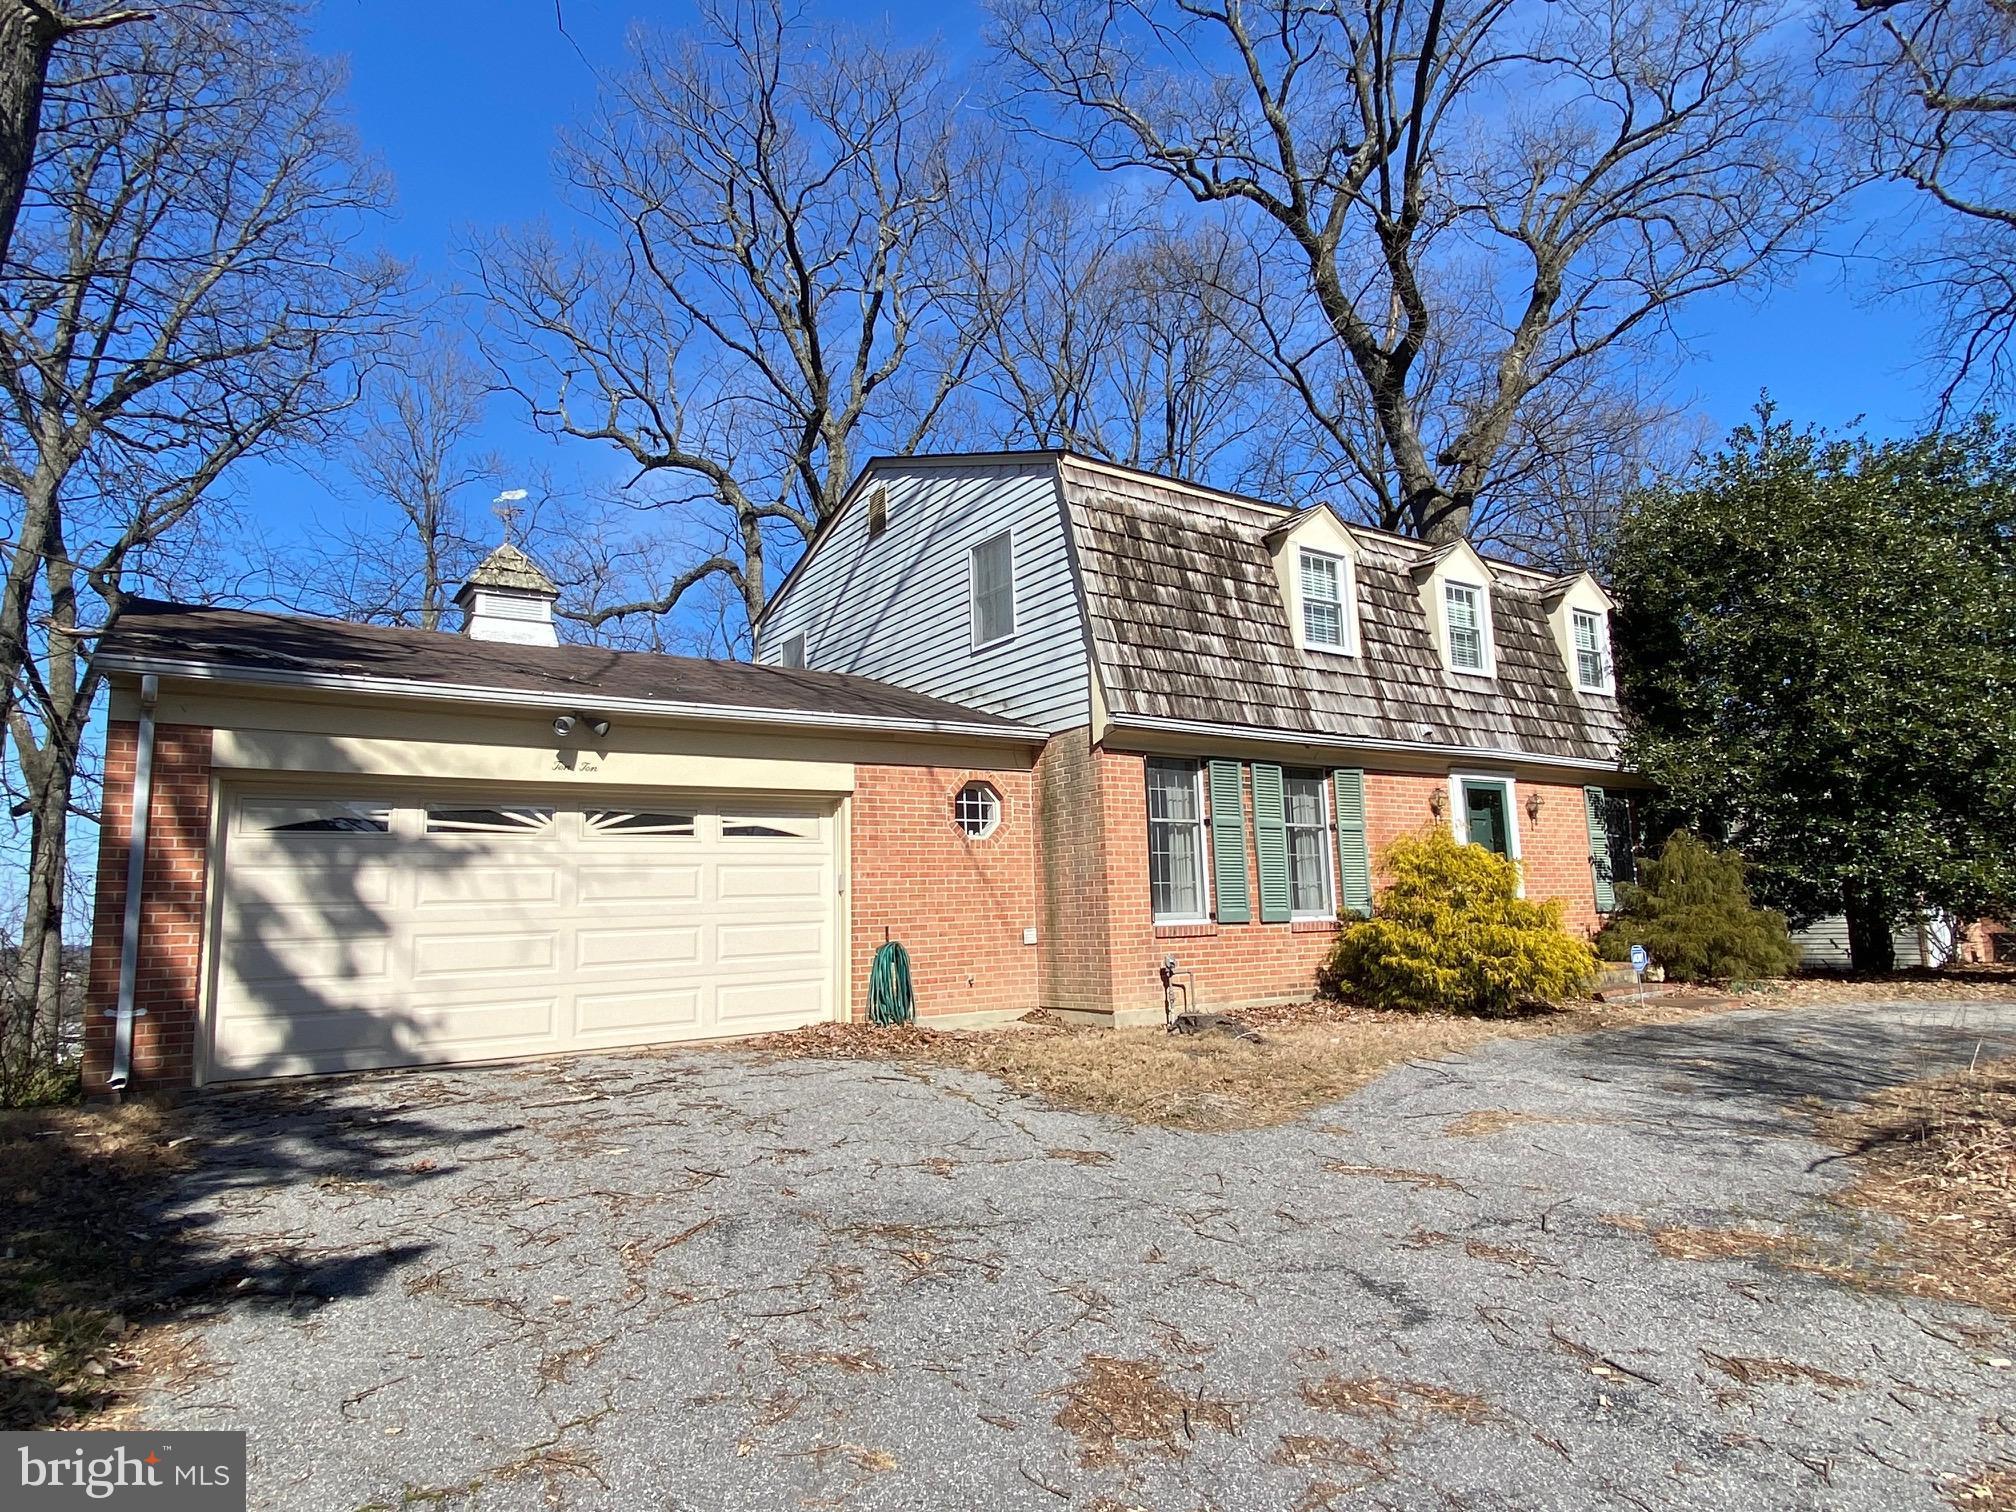 1010 W JOPPA ROAD, TOWSON, Maryland 21204, 4 Bedrooms Bedrooms, ,3 BathroomsBathrooms,Single Family,For Sale,1010 W JOPPA ROAD,MDBC522026